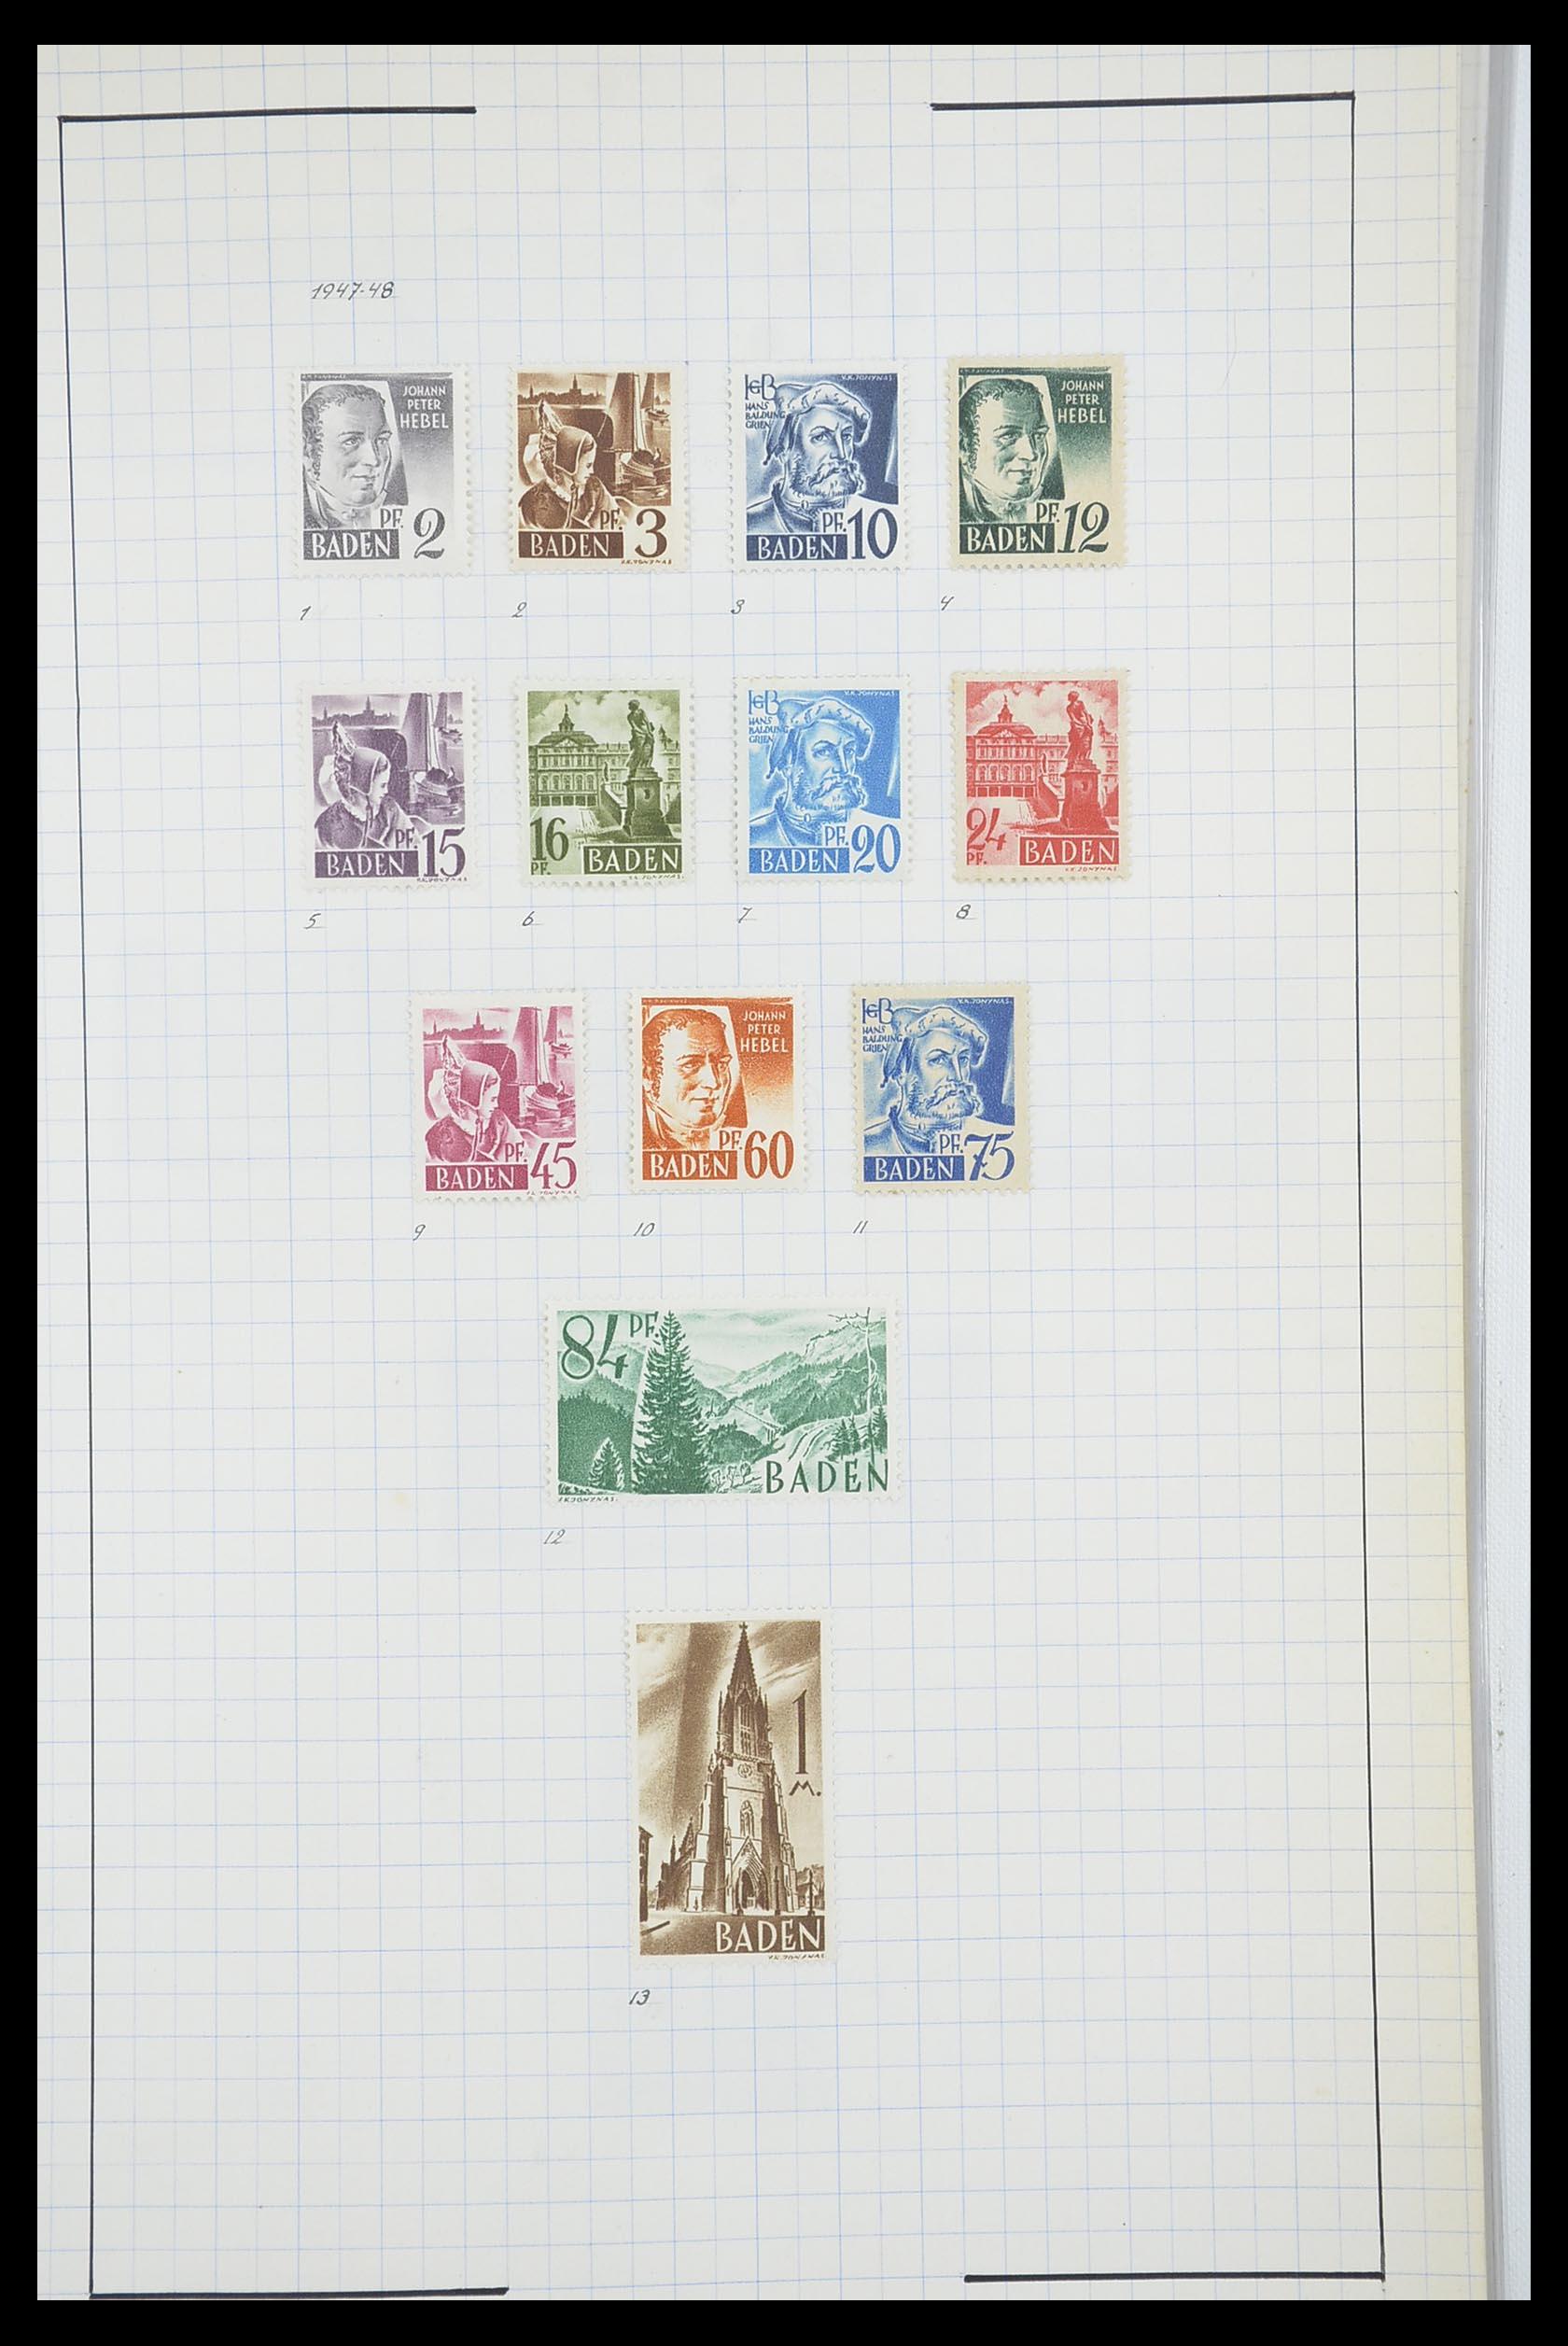 33864 005 - Postzegelverzameling 33864 Franse Zone 1945-1949.